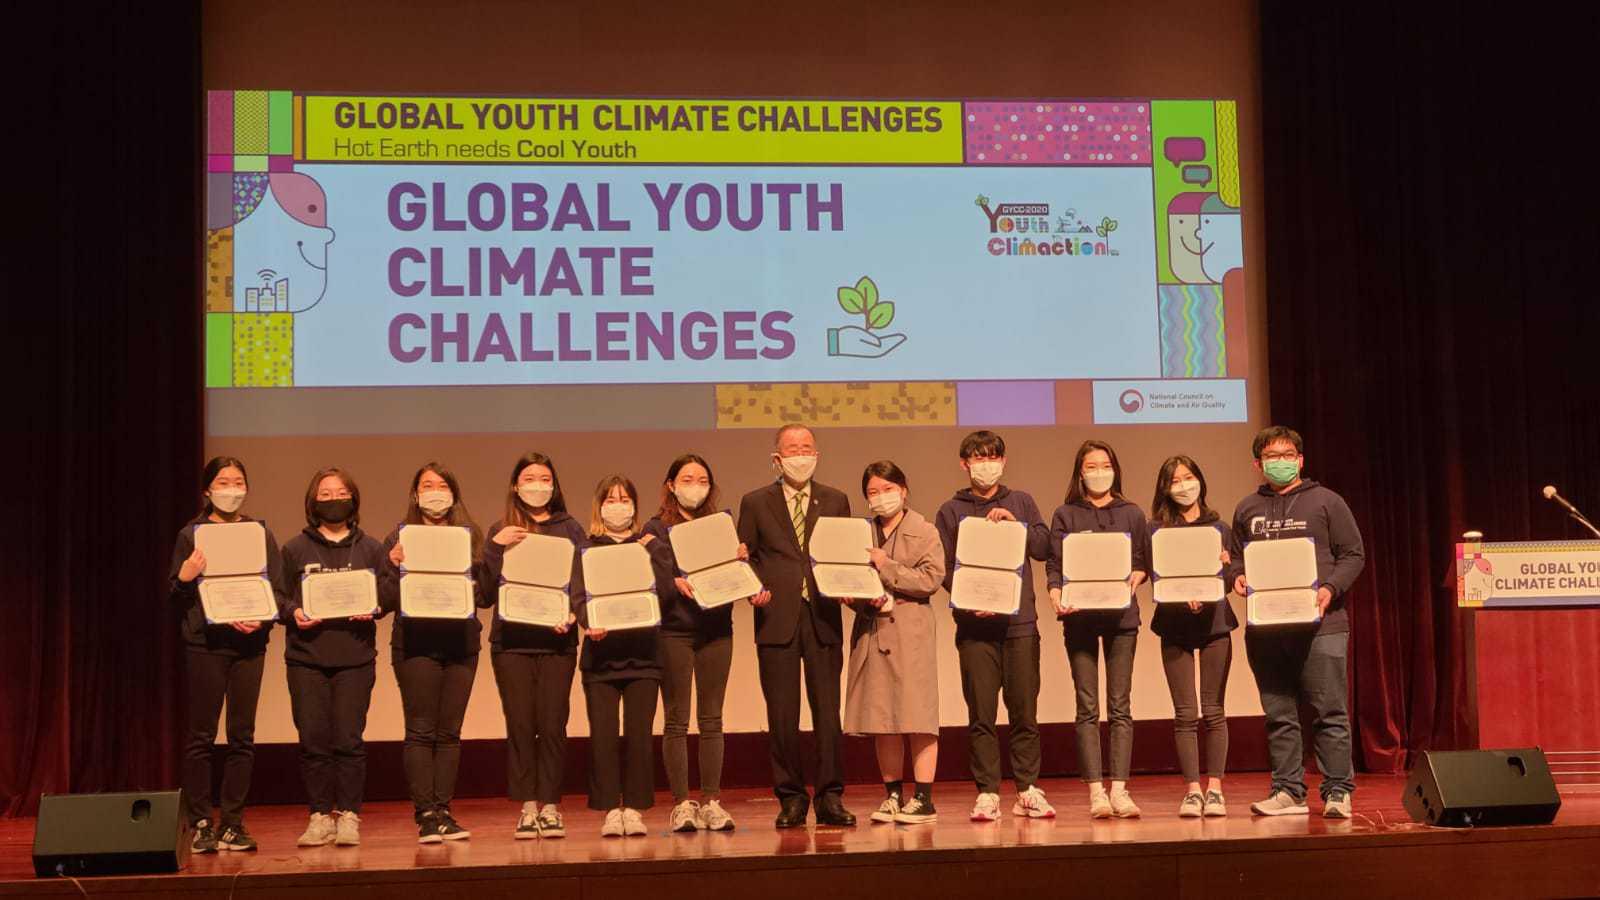 Mengikuti Global Youth Climate Challenges 2020 yang dipimpin Sekjen PBB ke-8 Ban Ki-moon.